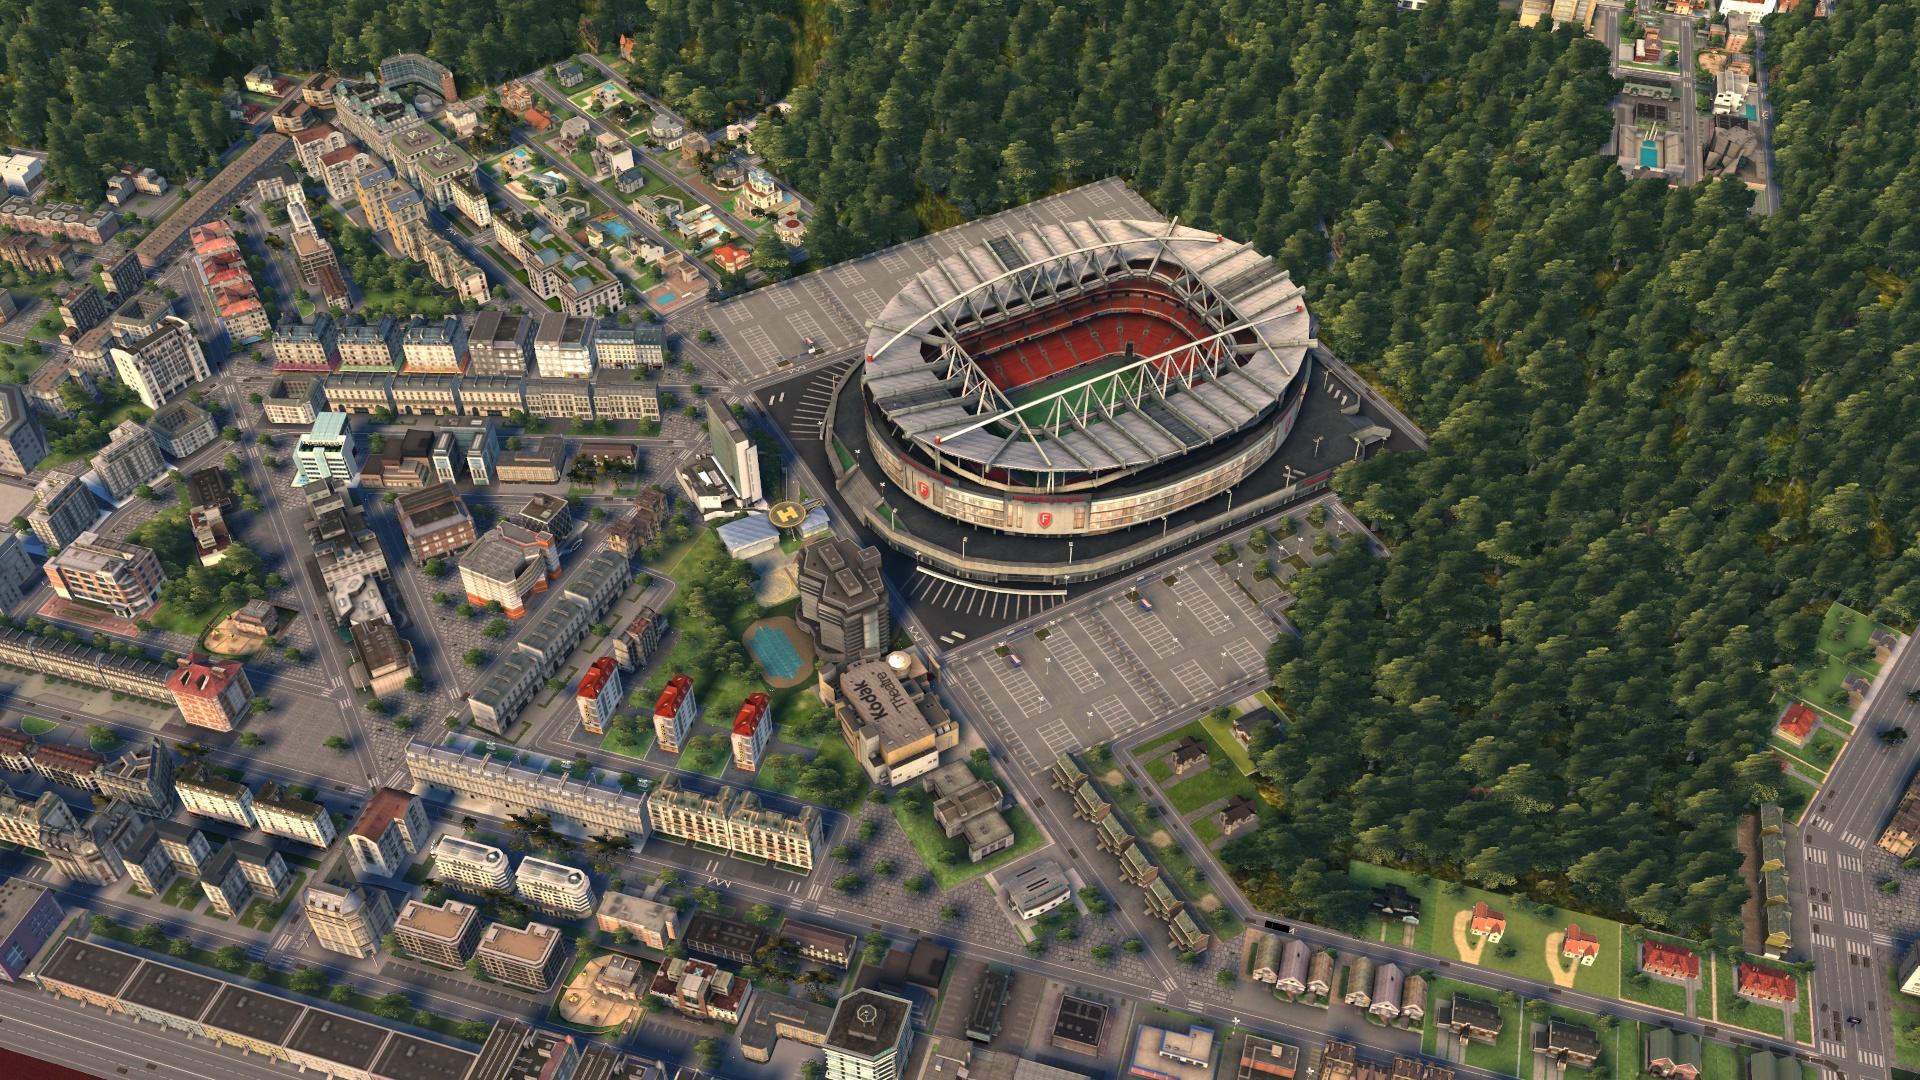 Coupe du monde de football de la FFGC 2020 - Page 4 Cxl_screenshot_palatoniala_728